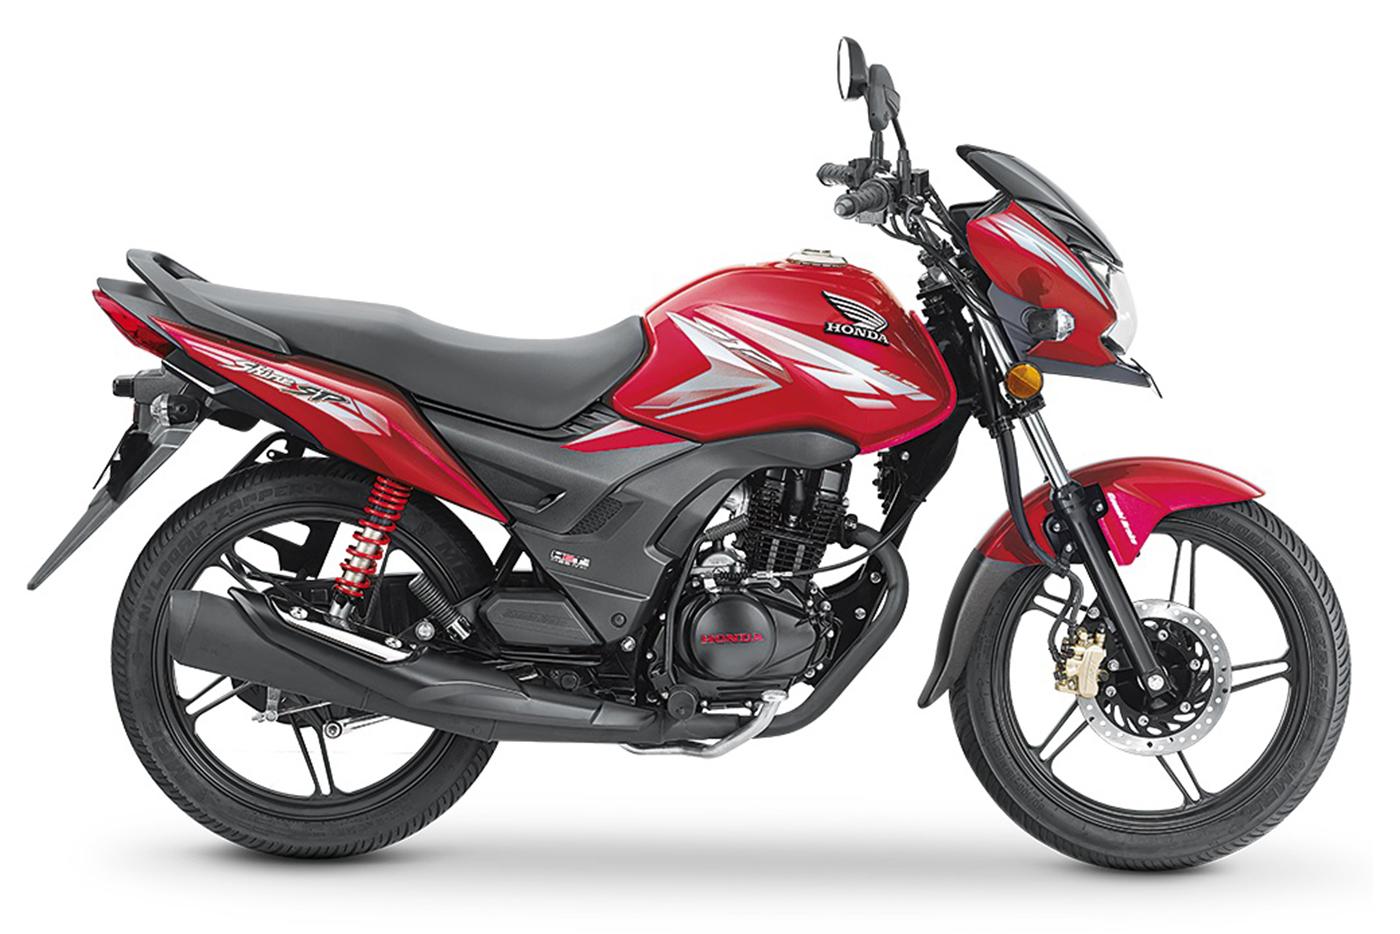 Honda Cb Shine Sp 2017 Xe C 244 N Tay Gi 225 Rẻ Tr 236 Nh L 224 Ng